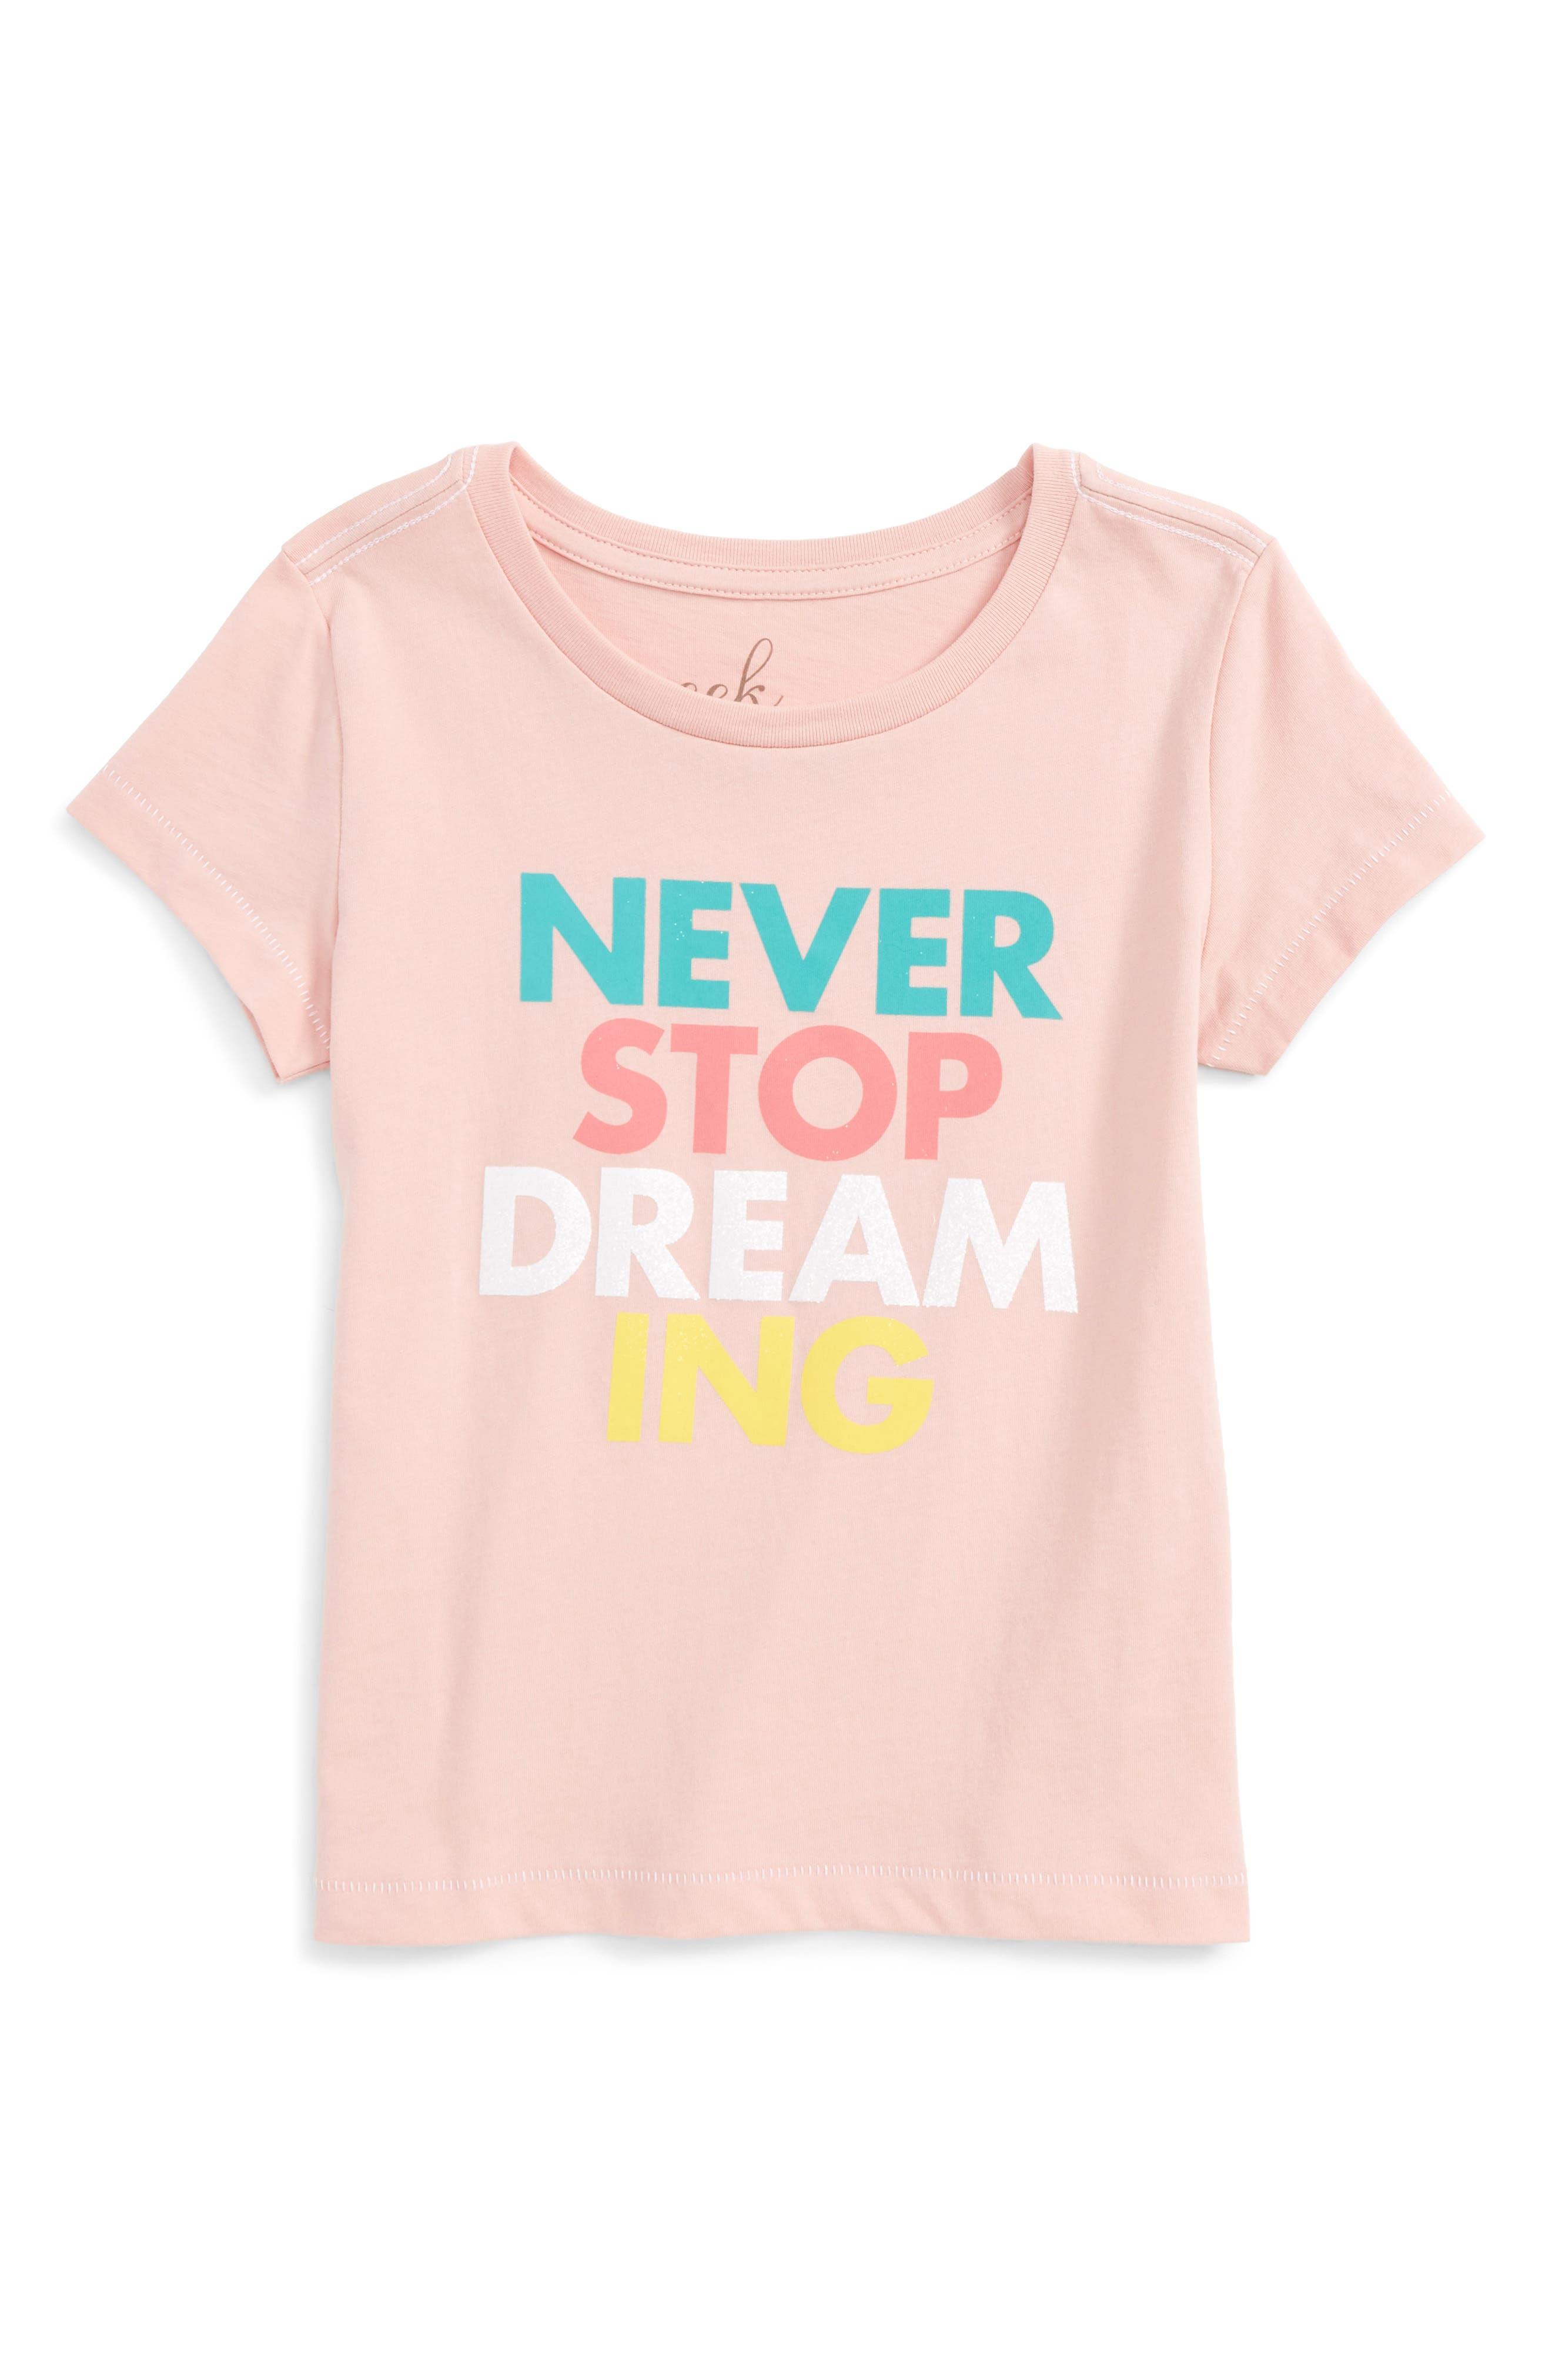 Peek Never Stop Dreaming Tee (Toddler Girls, Little Girls & Big Girls)